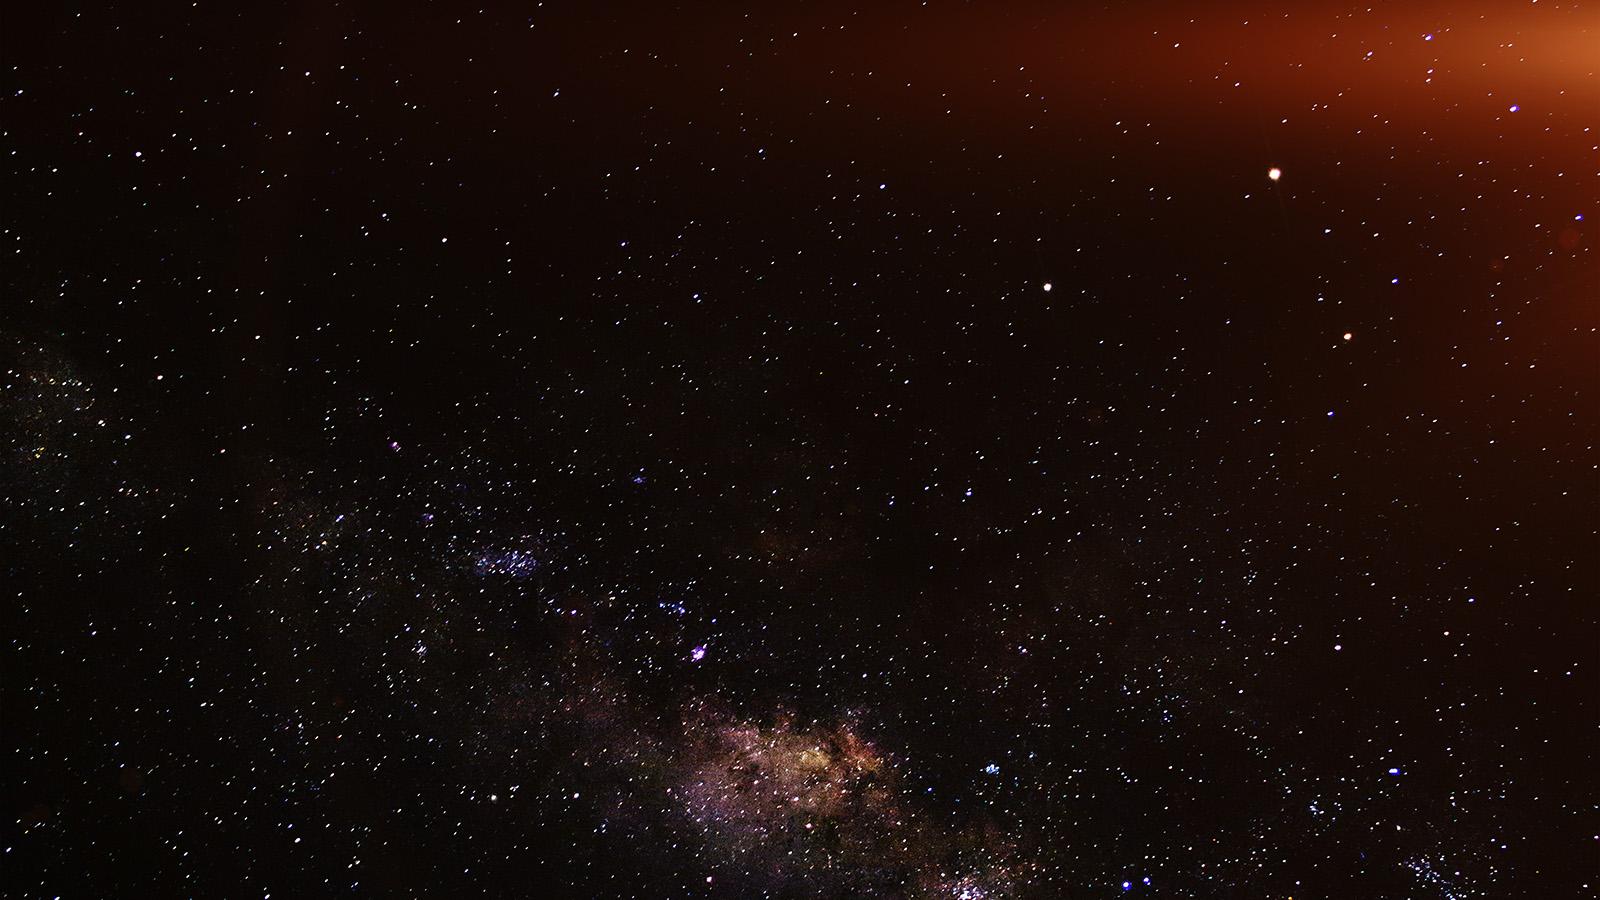 ni00-space-flare-night-sky-star-dark-wallpaper